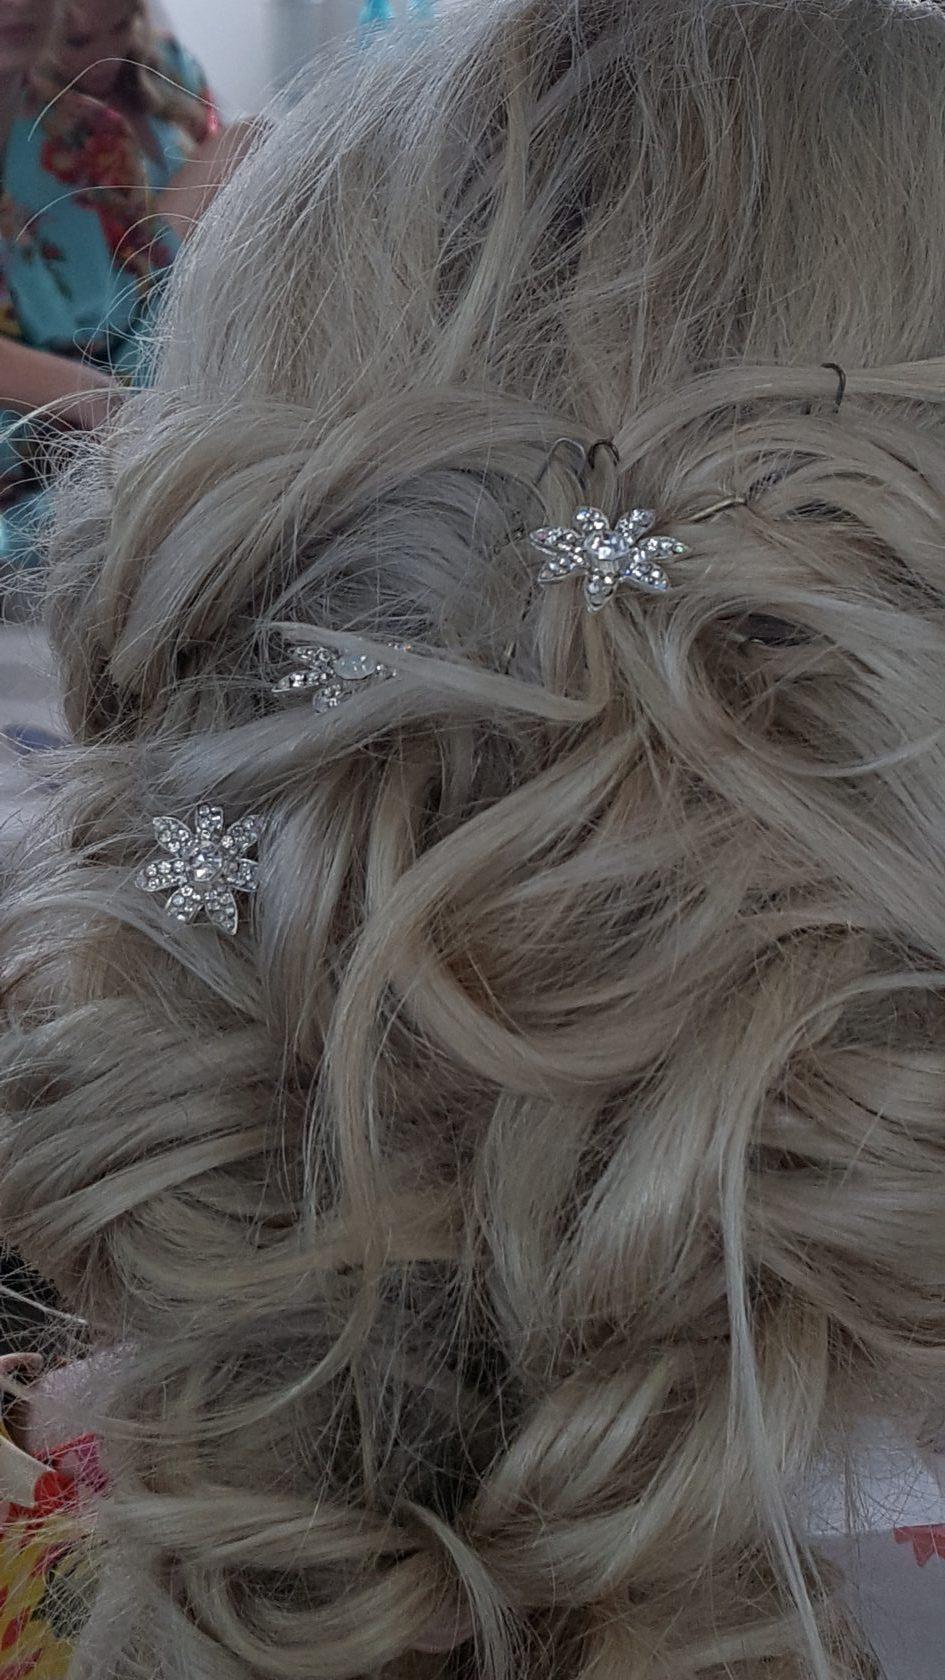 Shear Sailing Hair Salon Bridal Party Pre-Wedding Hair Services Brides Hair and Makeup